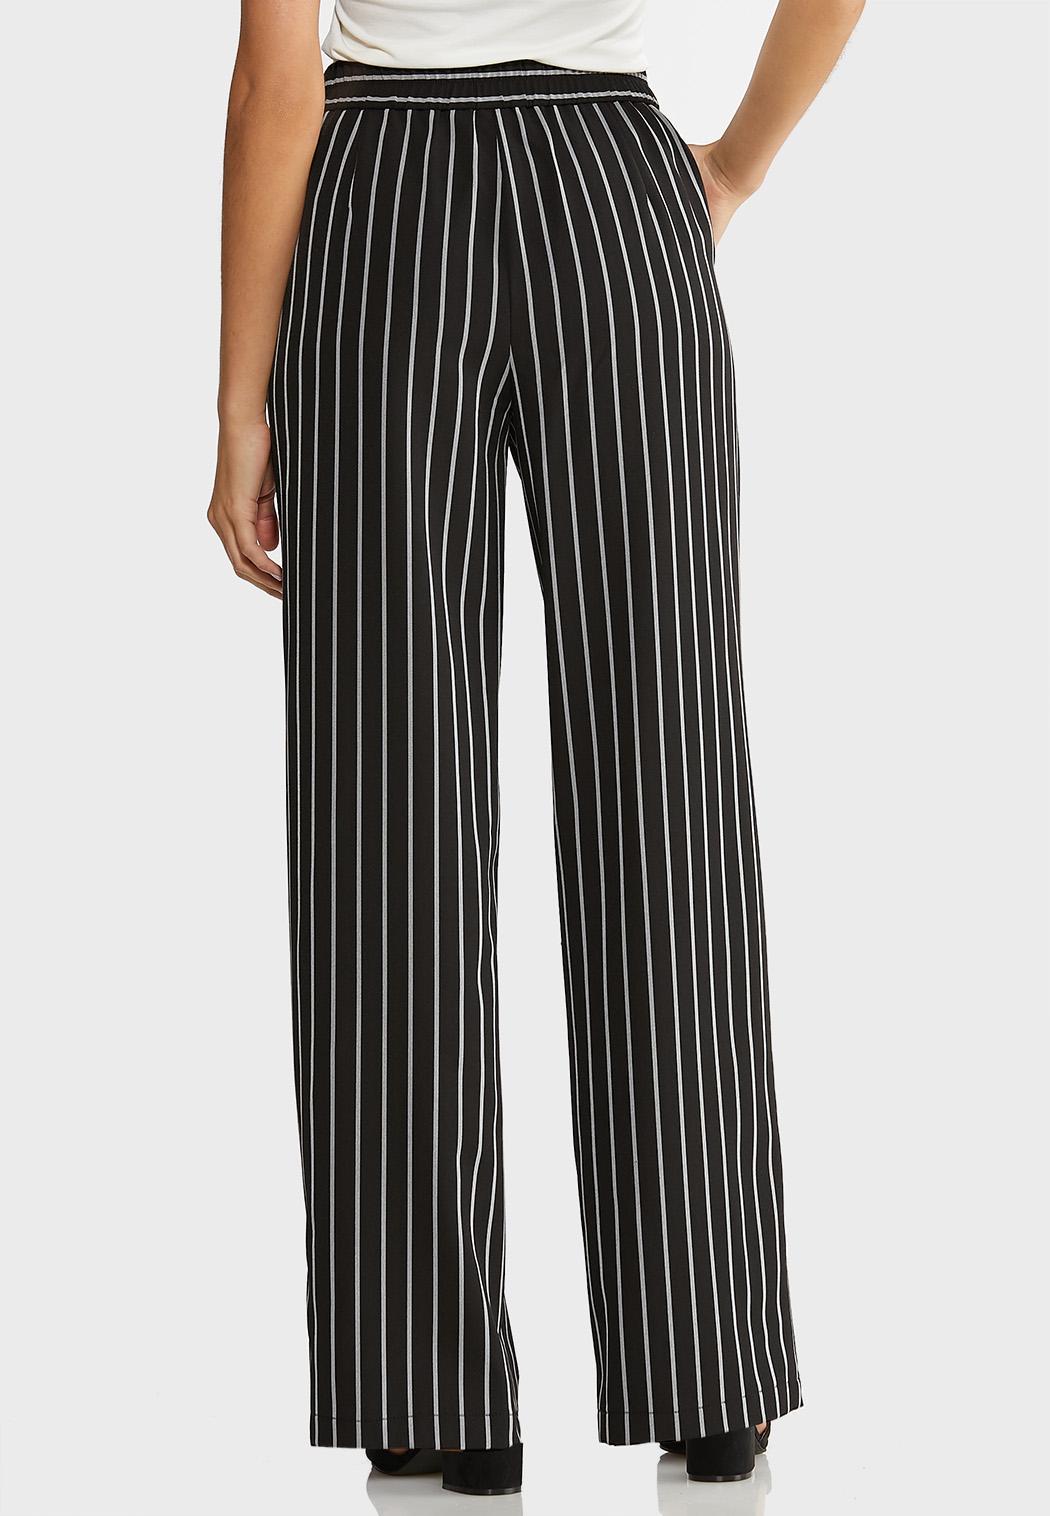 Petite Belted Wide Leg Pants (Item #43927072)